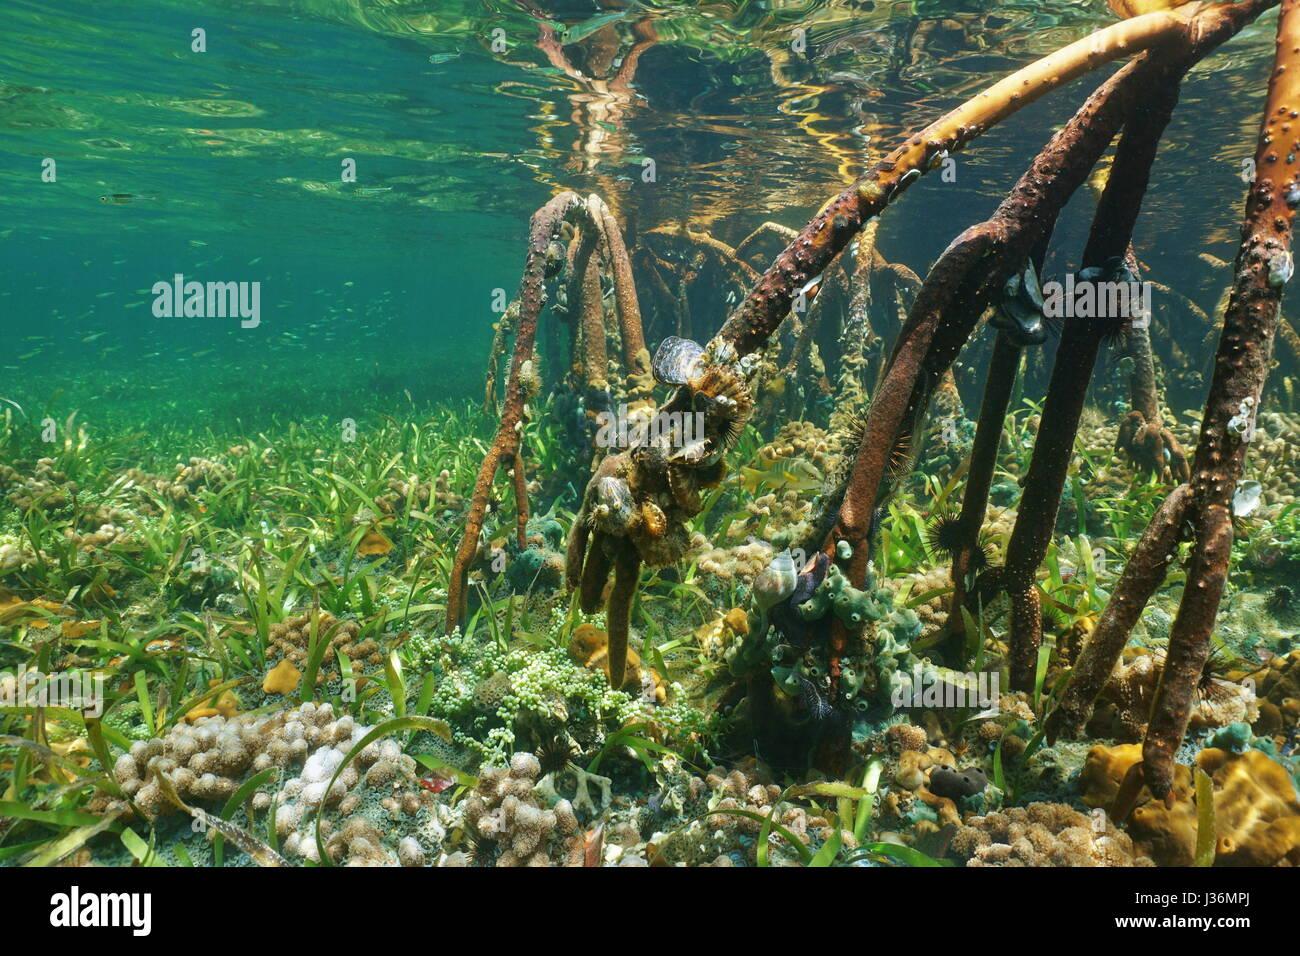 Roots of mangrove underwater with marine life, Atlantic ocean, Bahamas - Stock Image